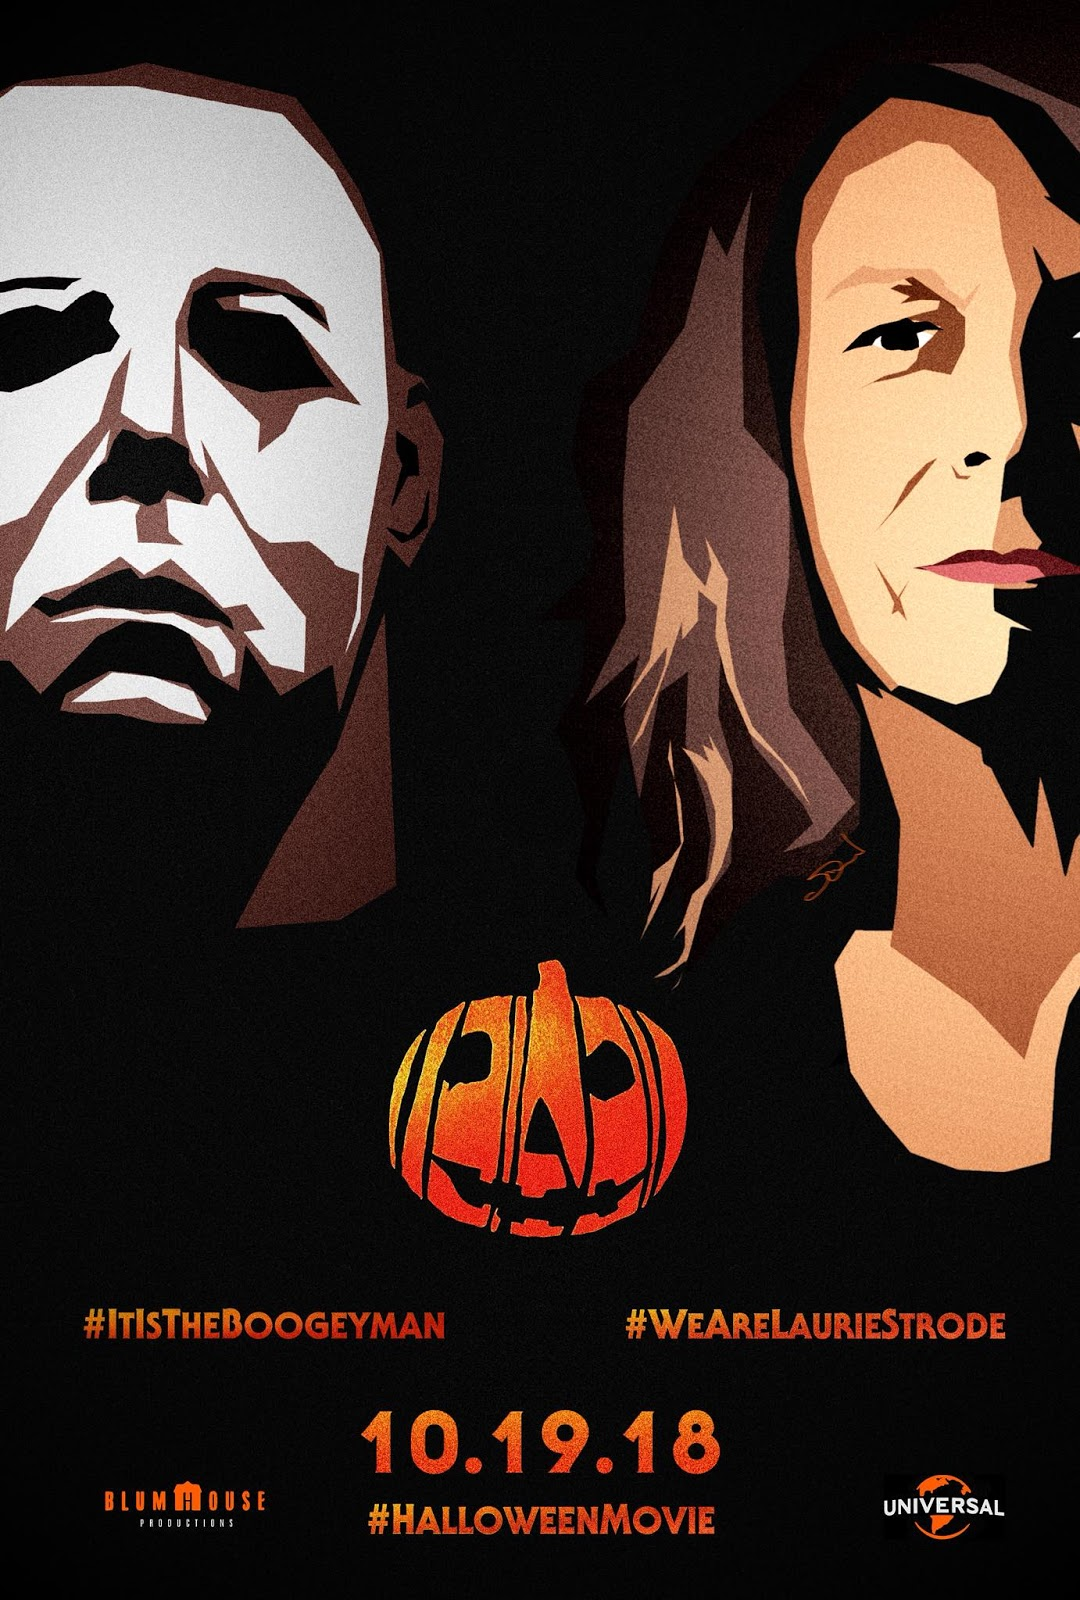 the horrors of halloween: halloween (2018) fan artwork posters